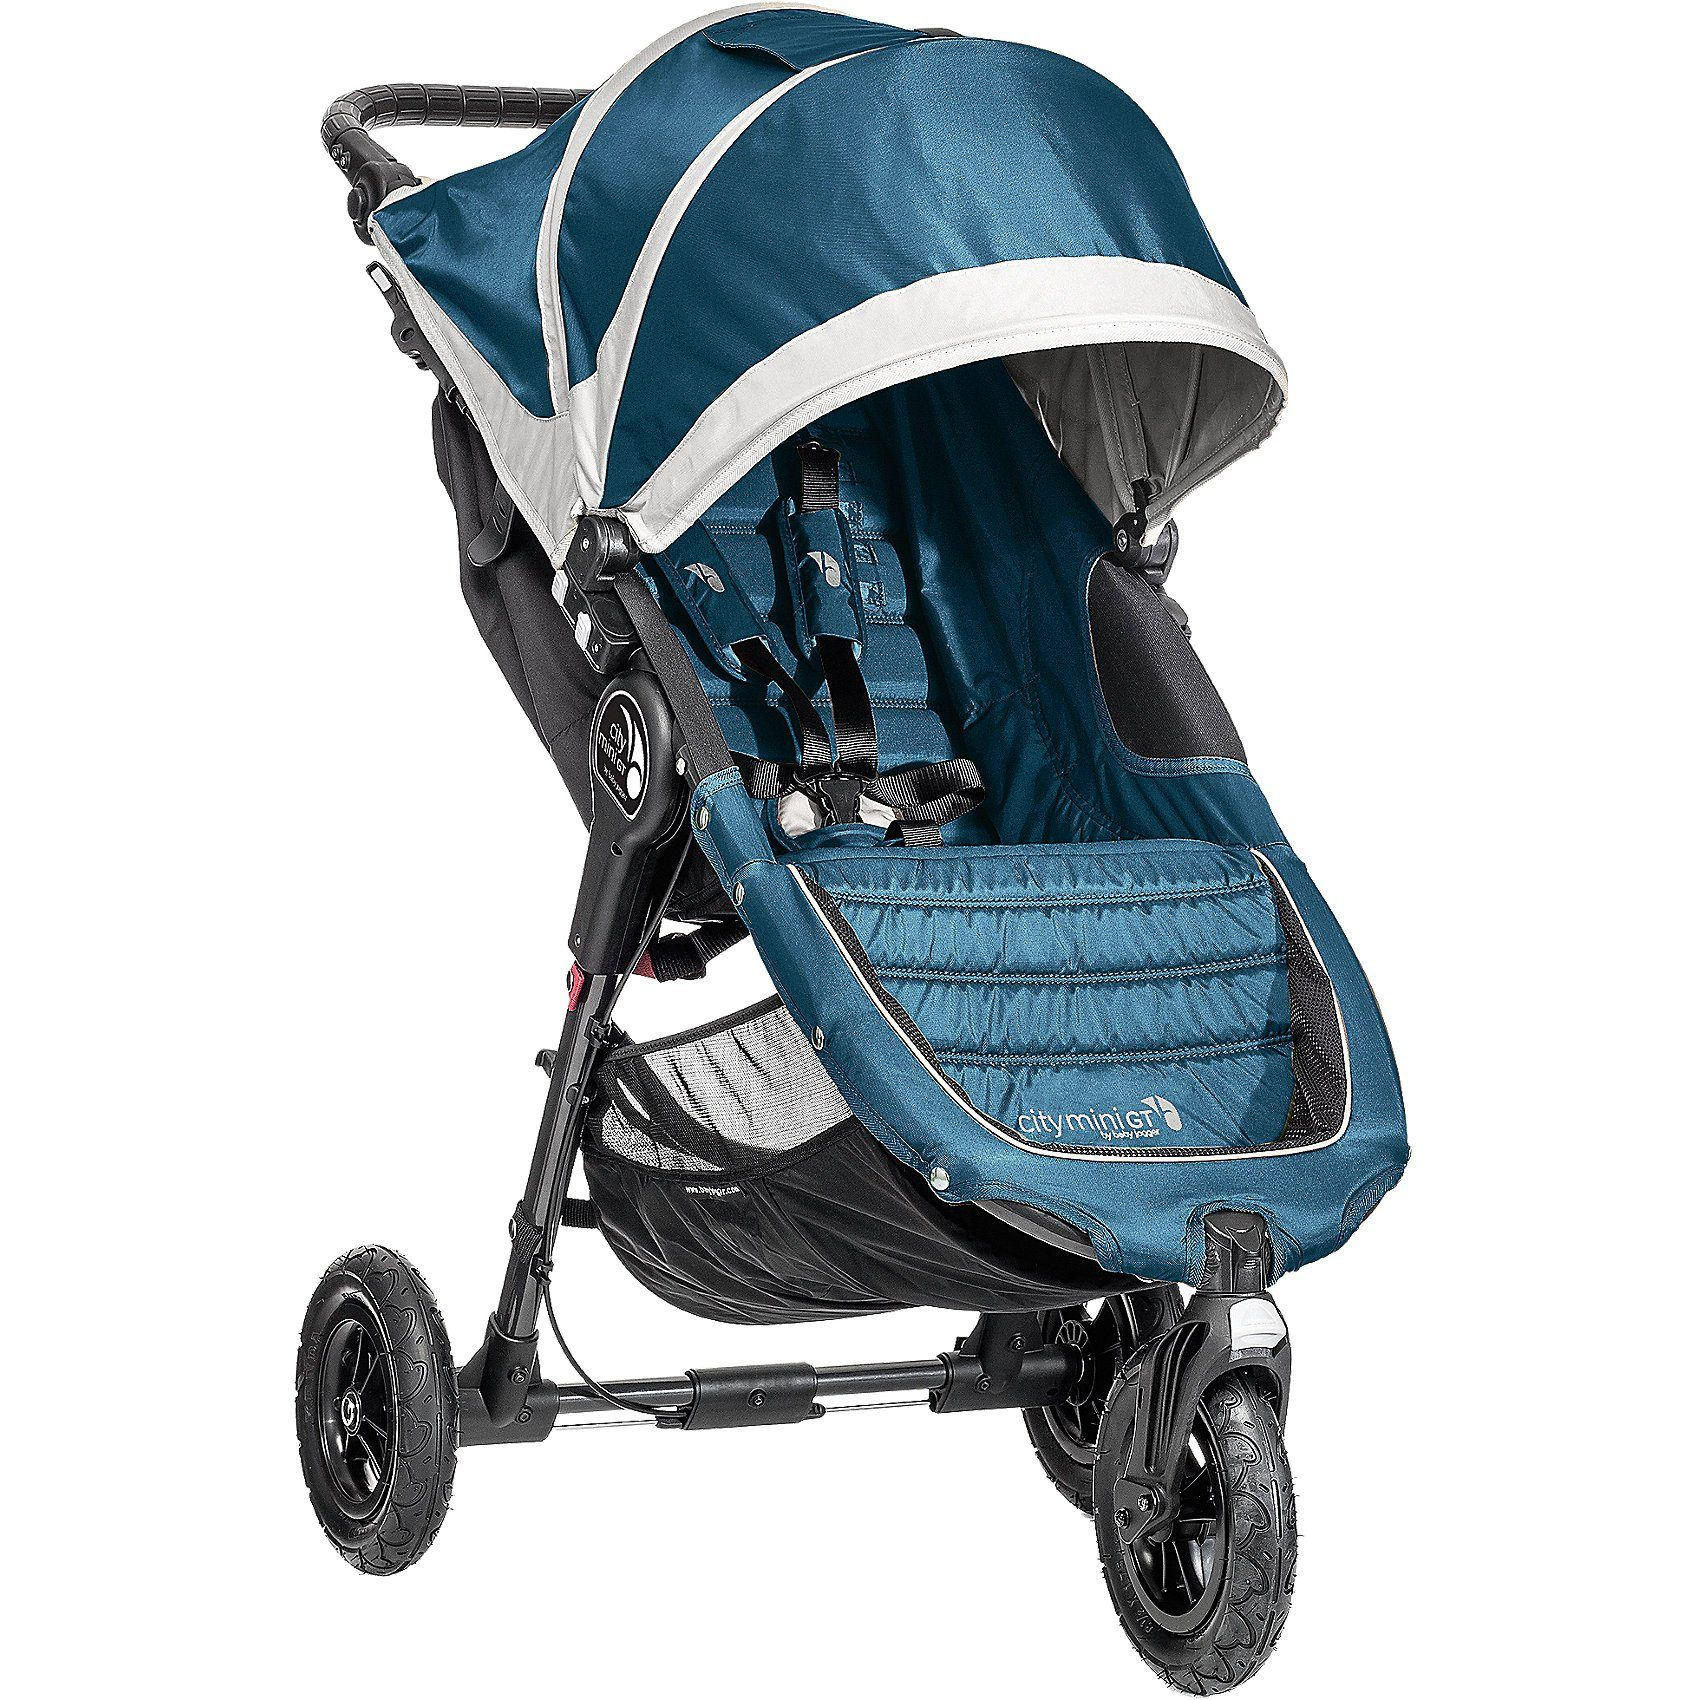 Baby Jogger Jogger City Mini GT, teal/ gray, 2016